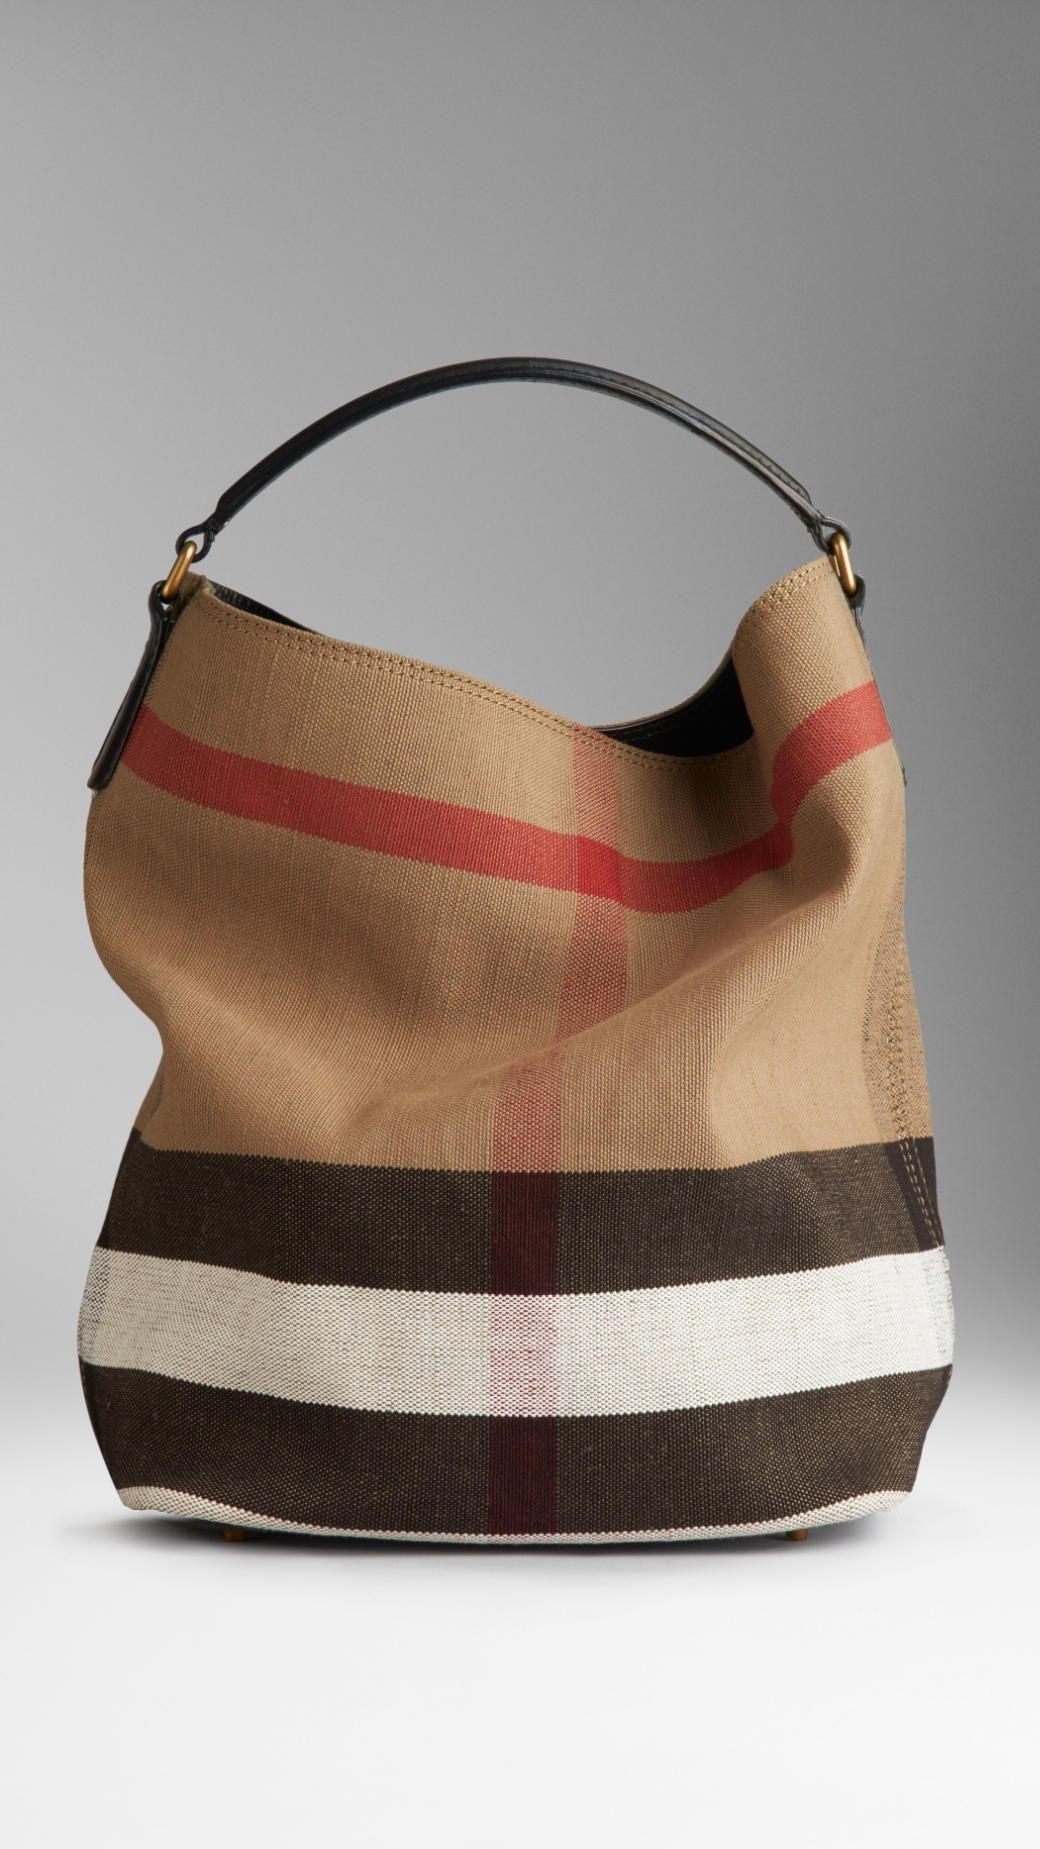 e5db8ab6e79a Medium Canvas Check Hobo Bag   Burberry   accessories   Hobo taschen ...